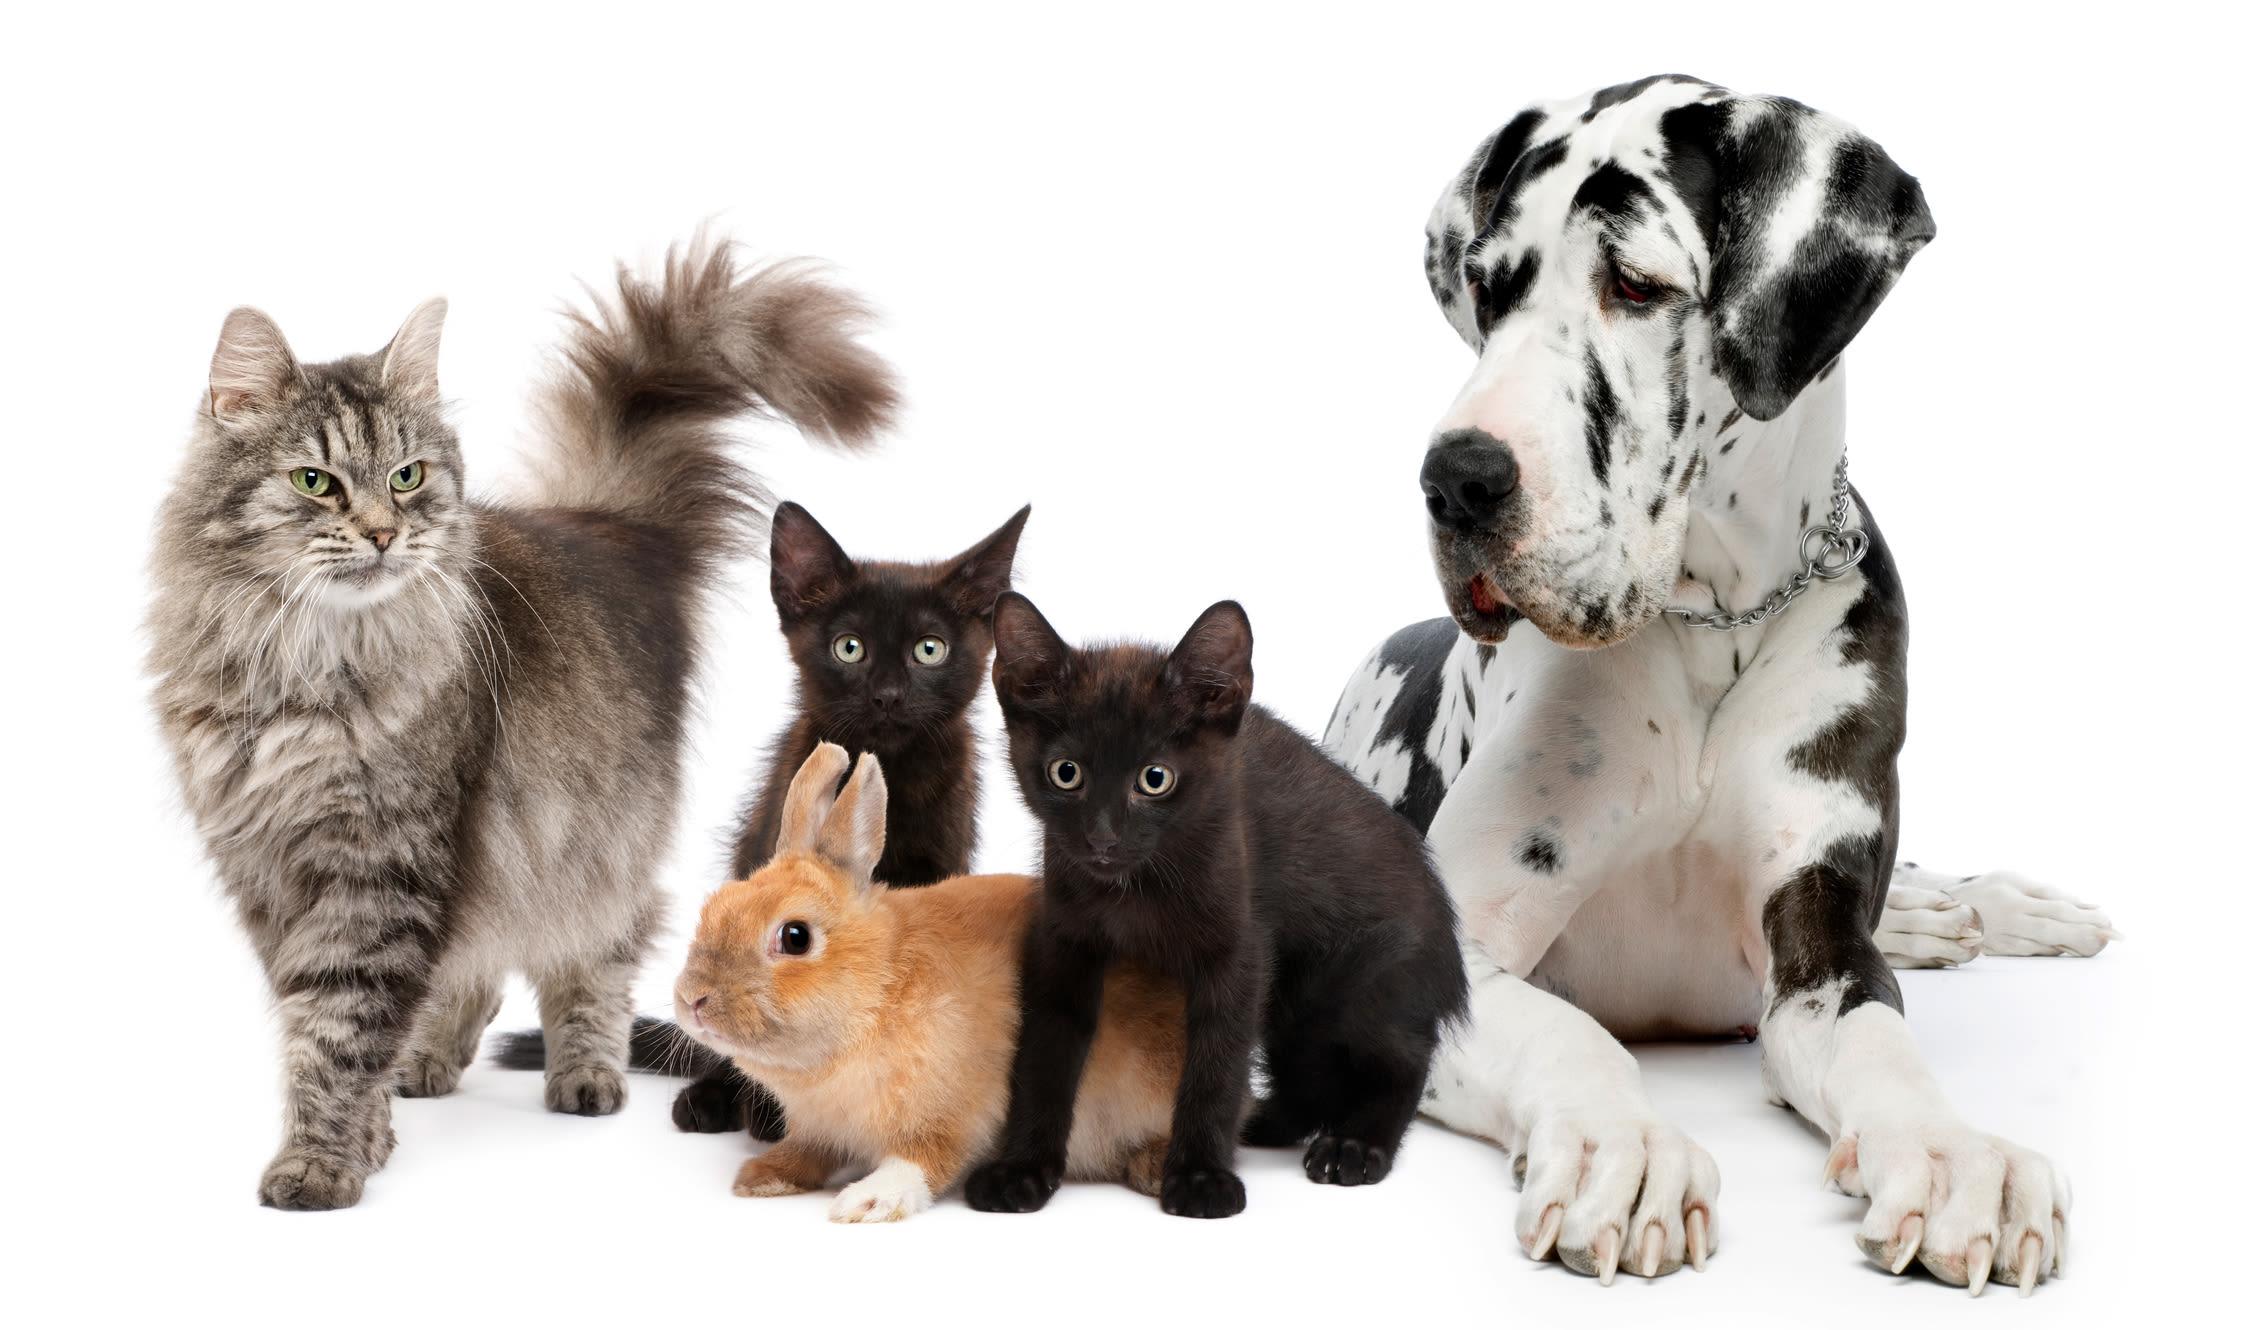 Our precious animals at Black Forest Veterinary Clinic in Colorado Springs, Colorado